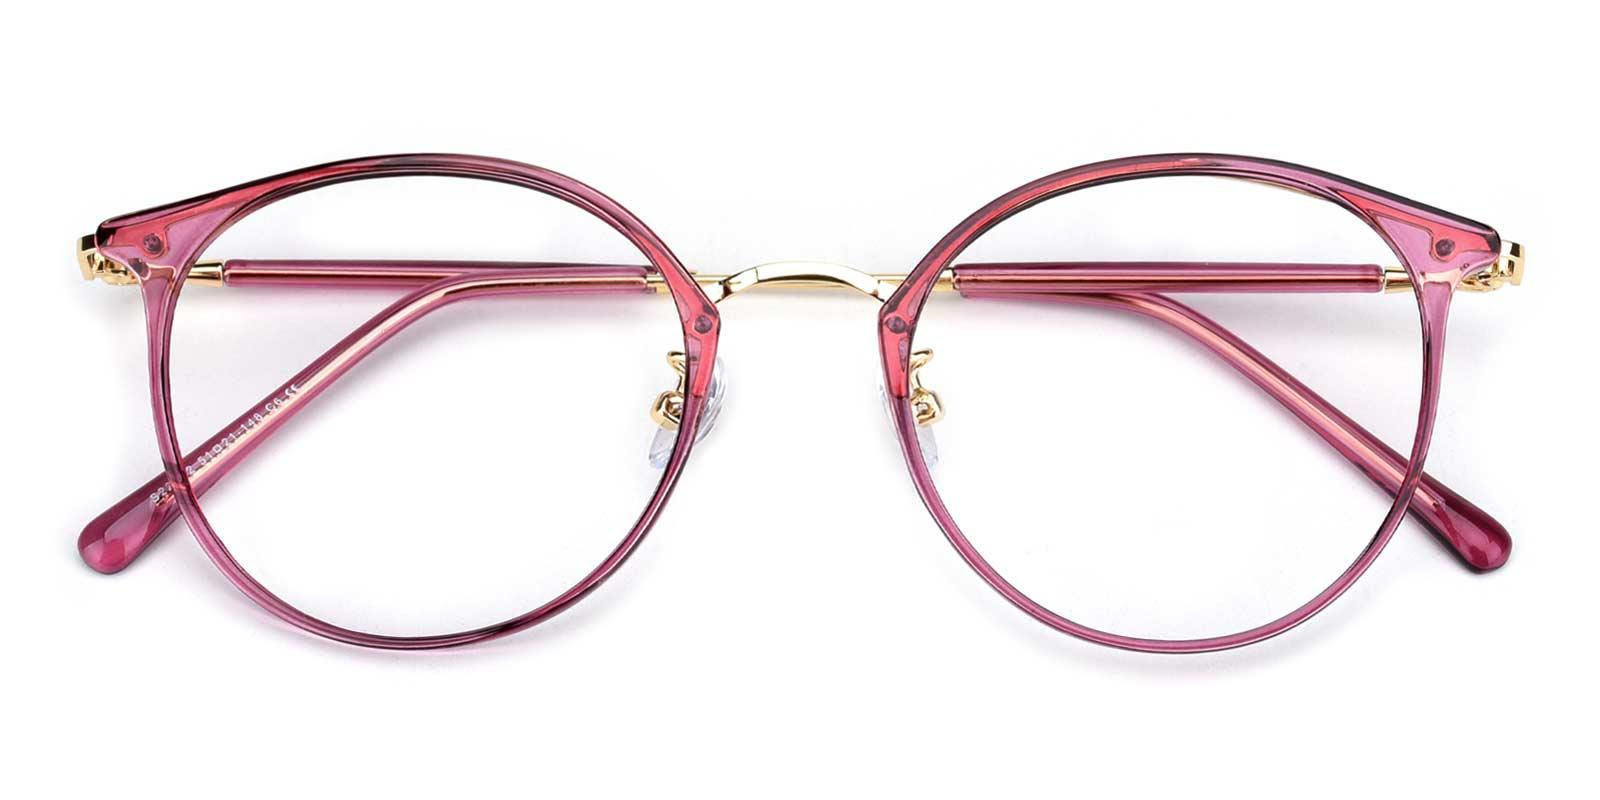 Louise-Red-Round-TR-Eyeglasses-detail